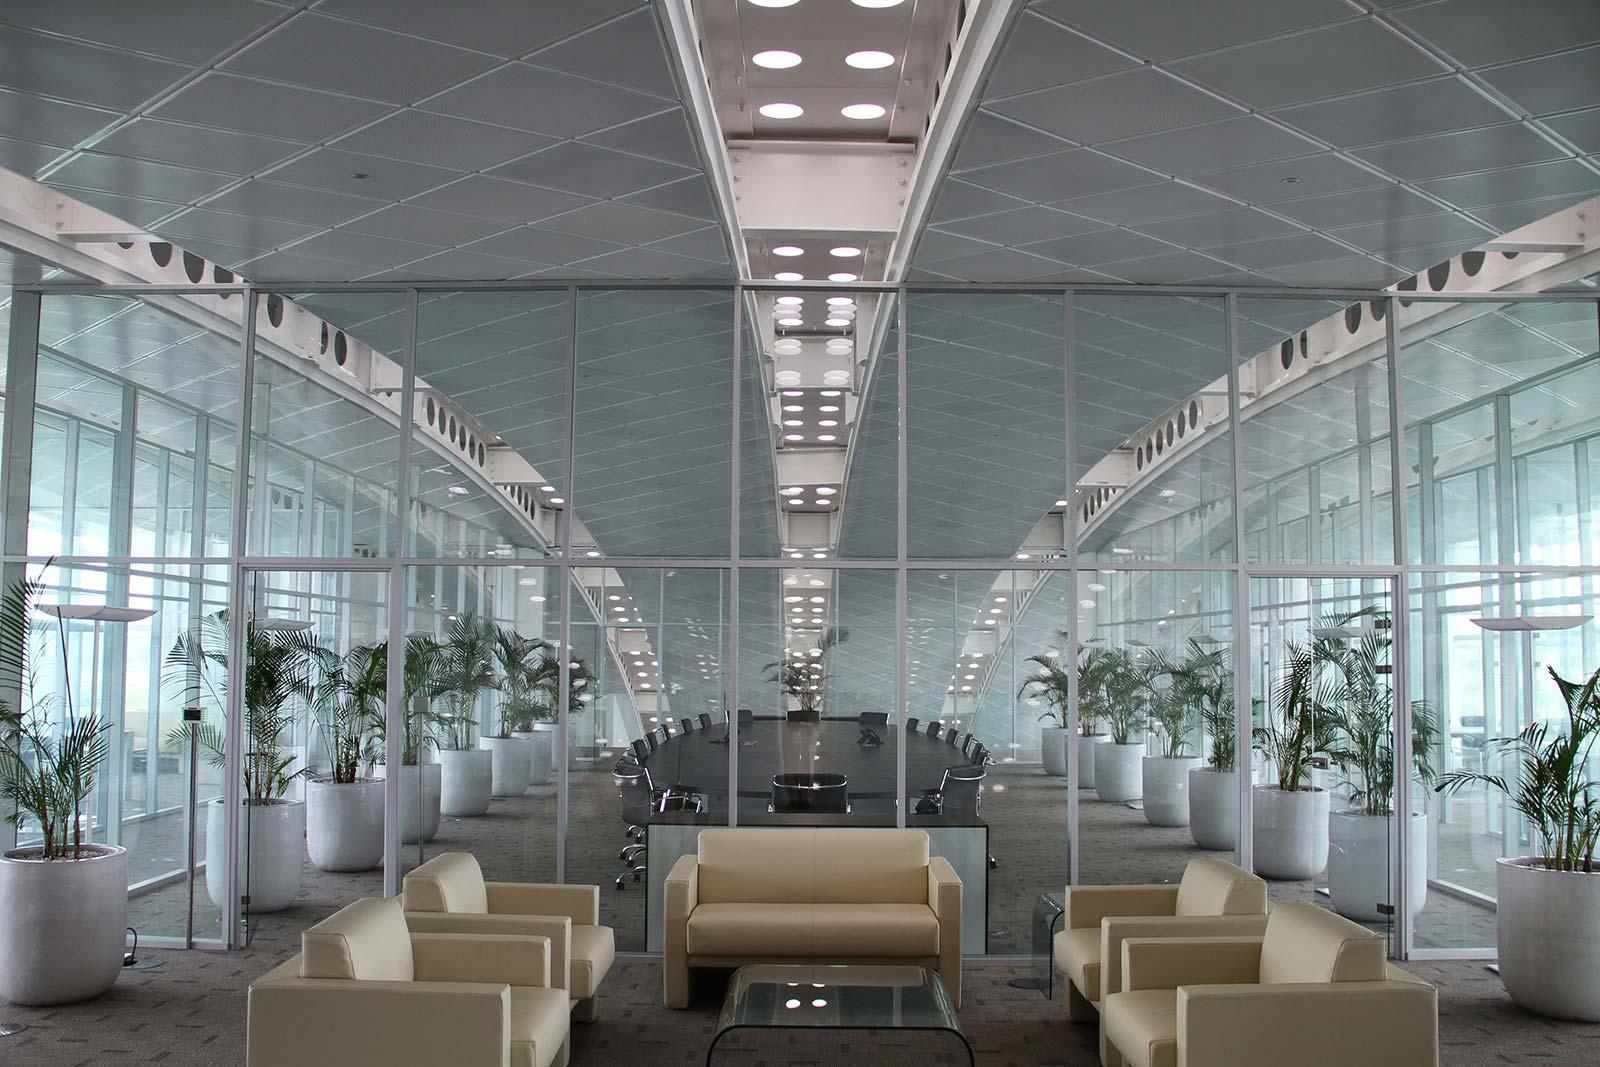 the-mauritius-commercial-bank-ebene_jean-francois-koenig-interior-space